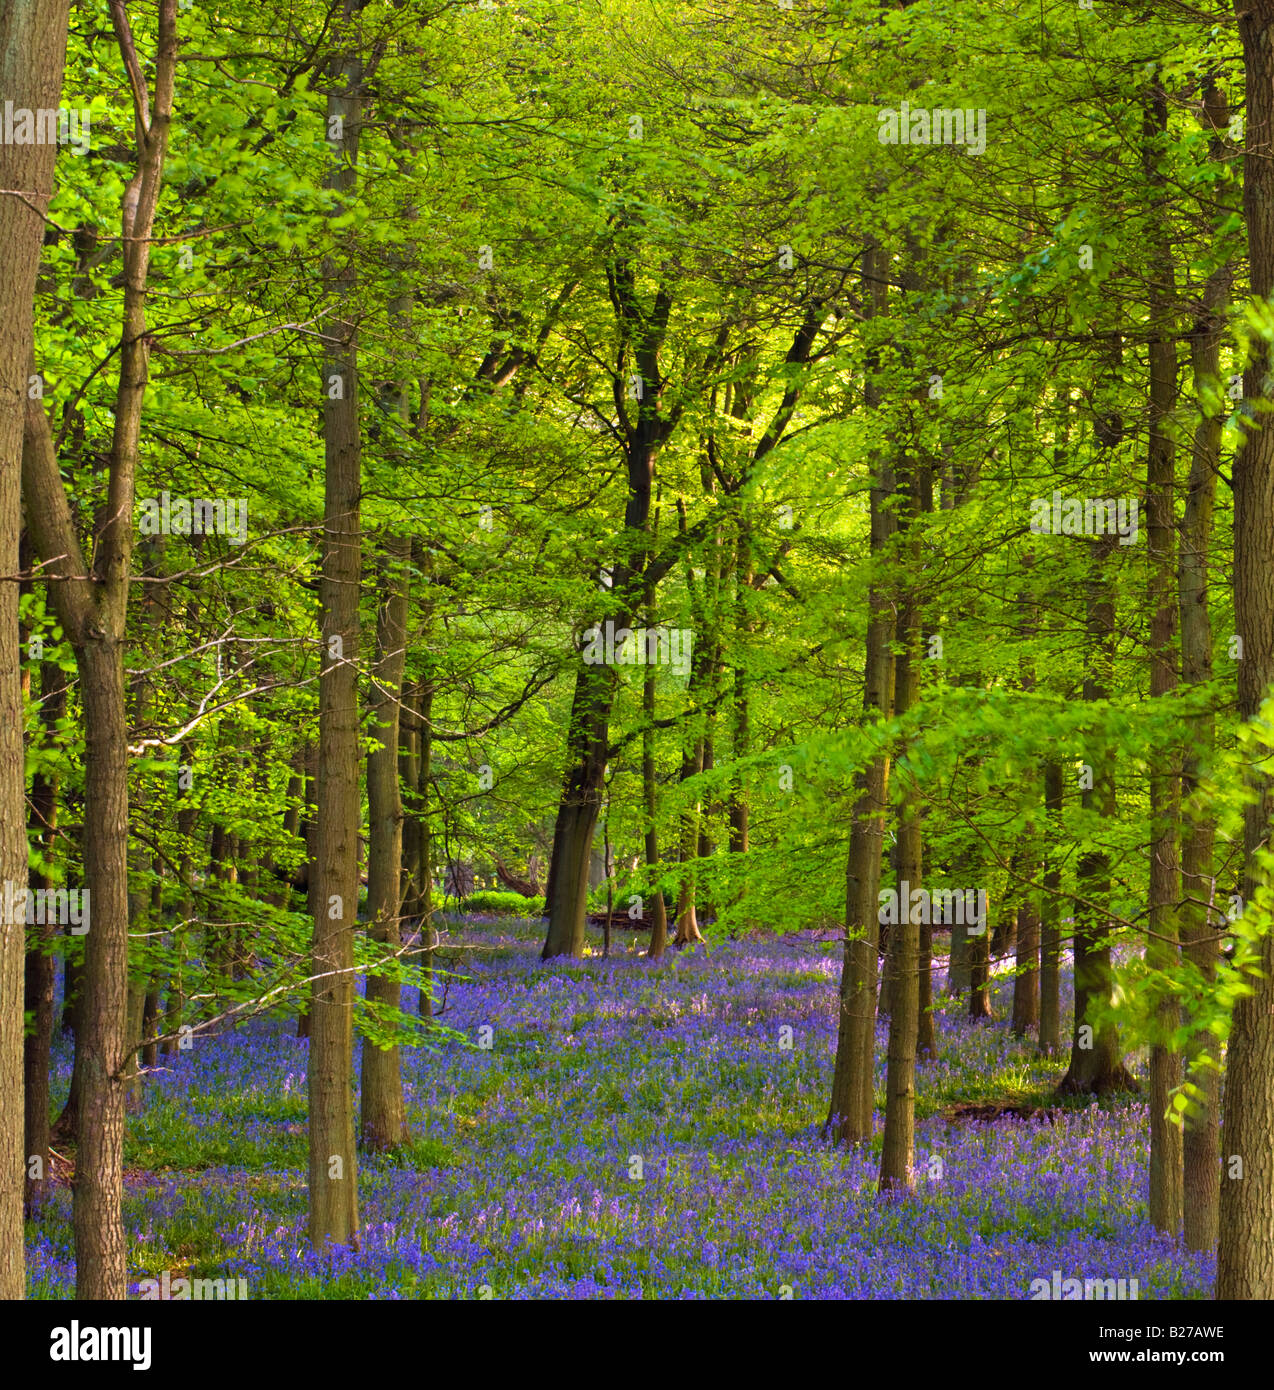 Carpet of Bluebells - Stock Image